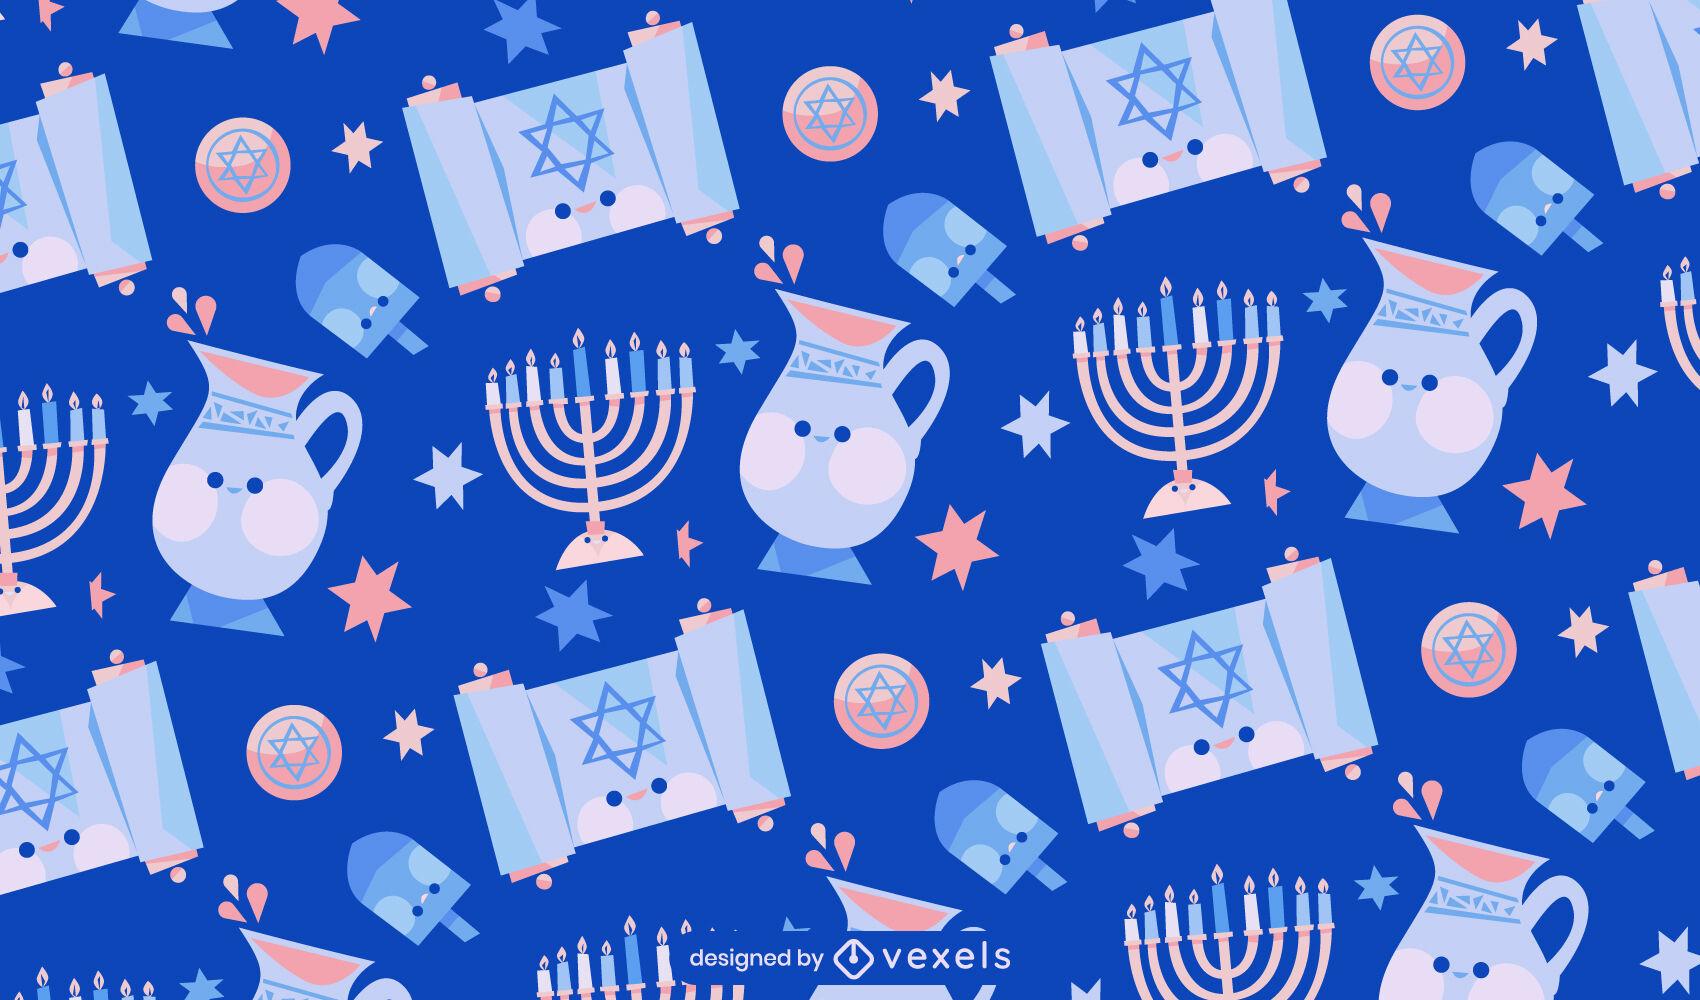 Dise?o de patr?n kawaii de la fiesta jud?a de Hanukkah